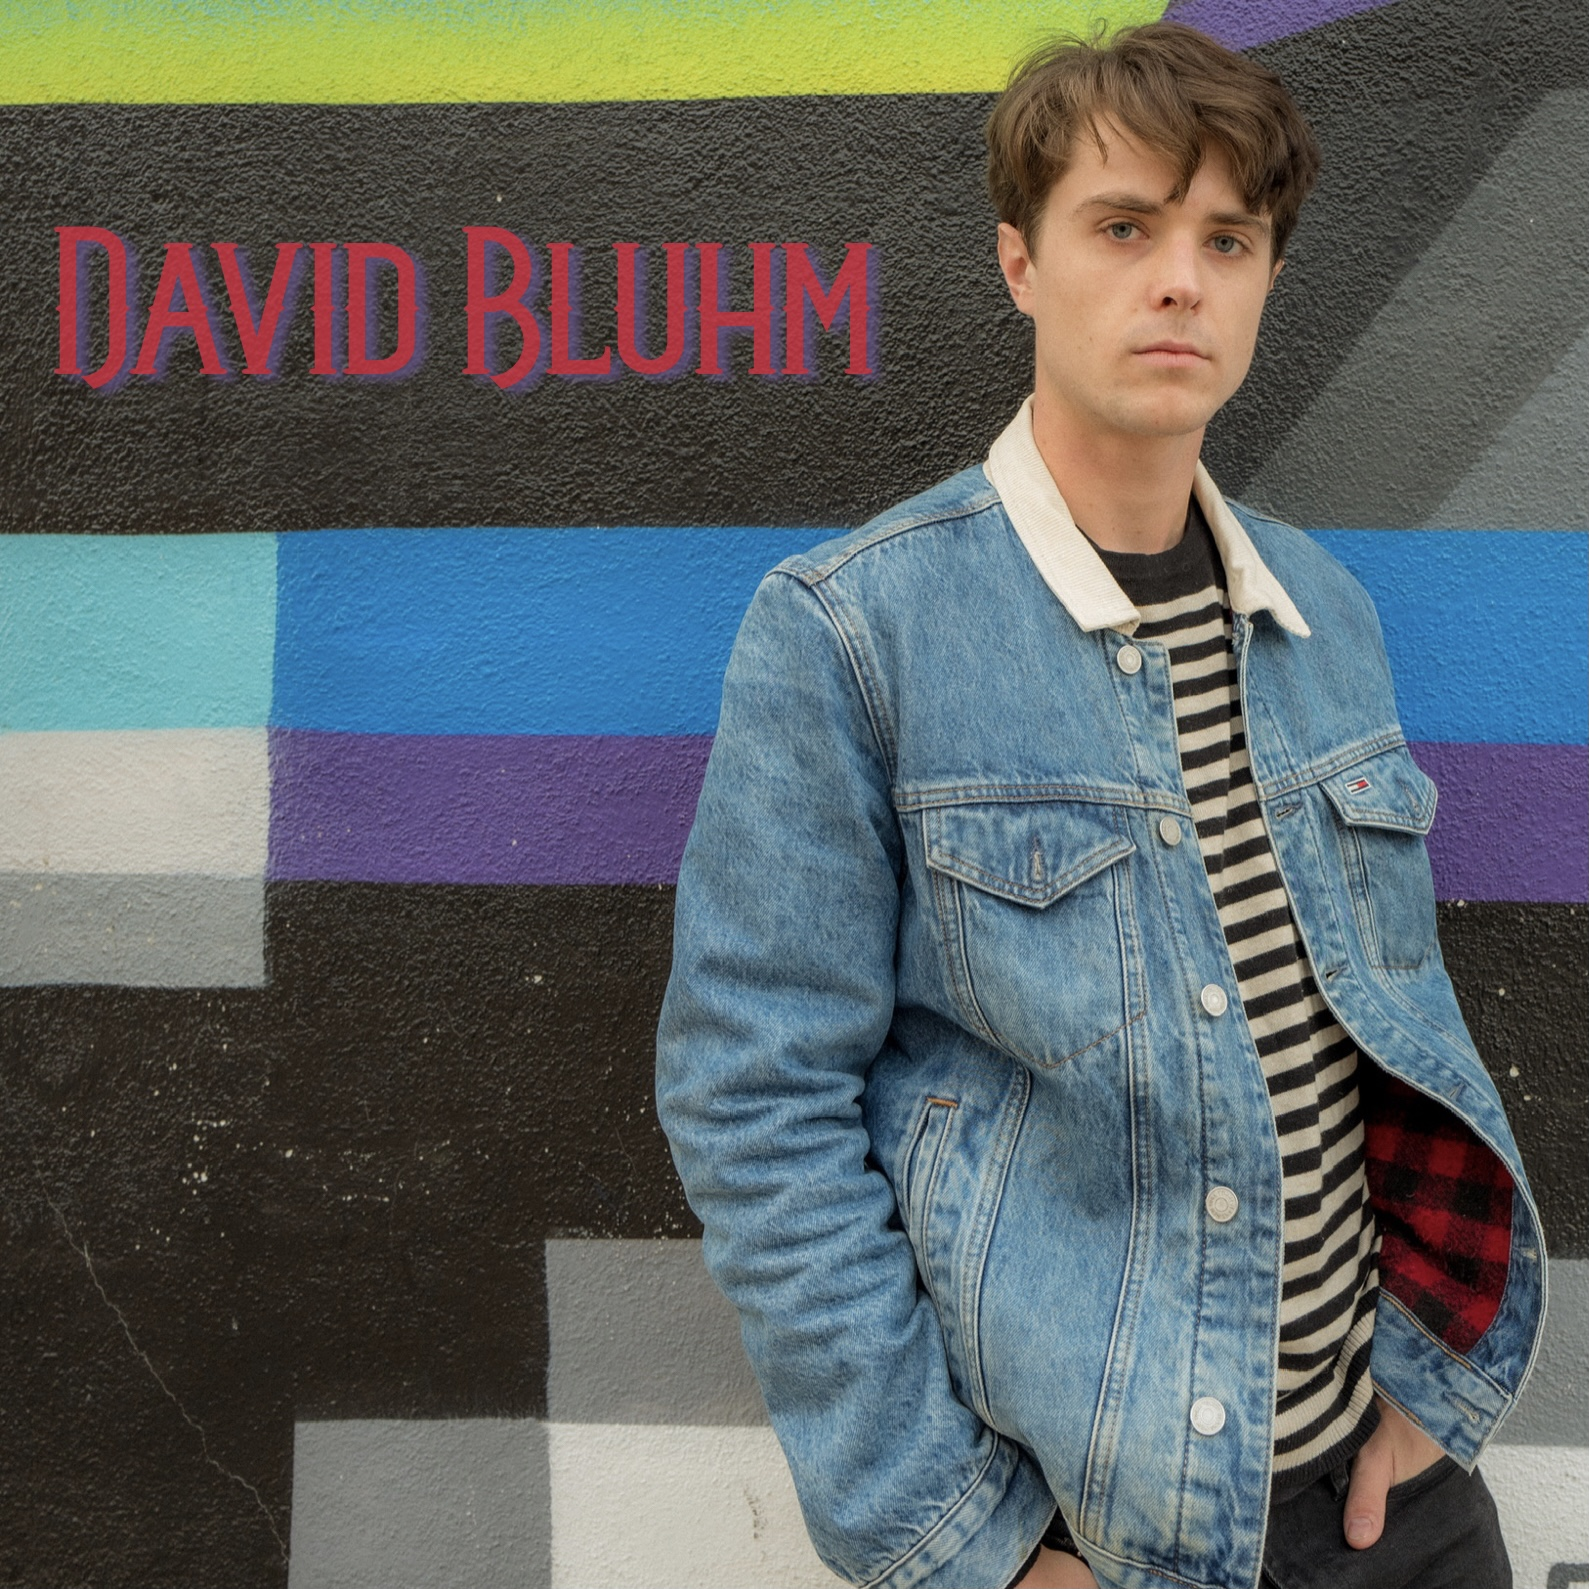 David Bluhm